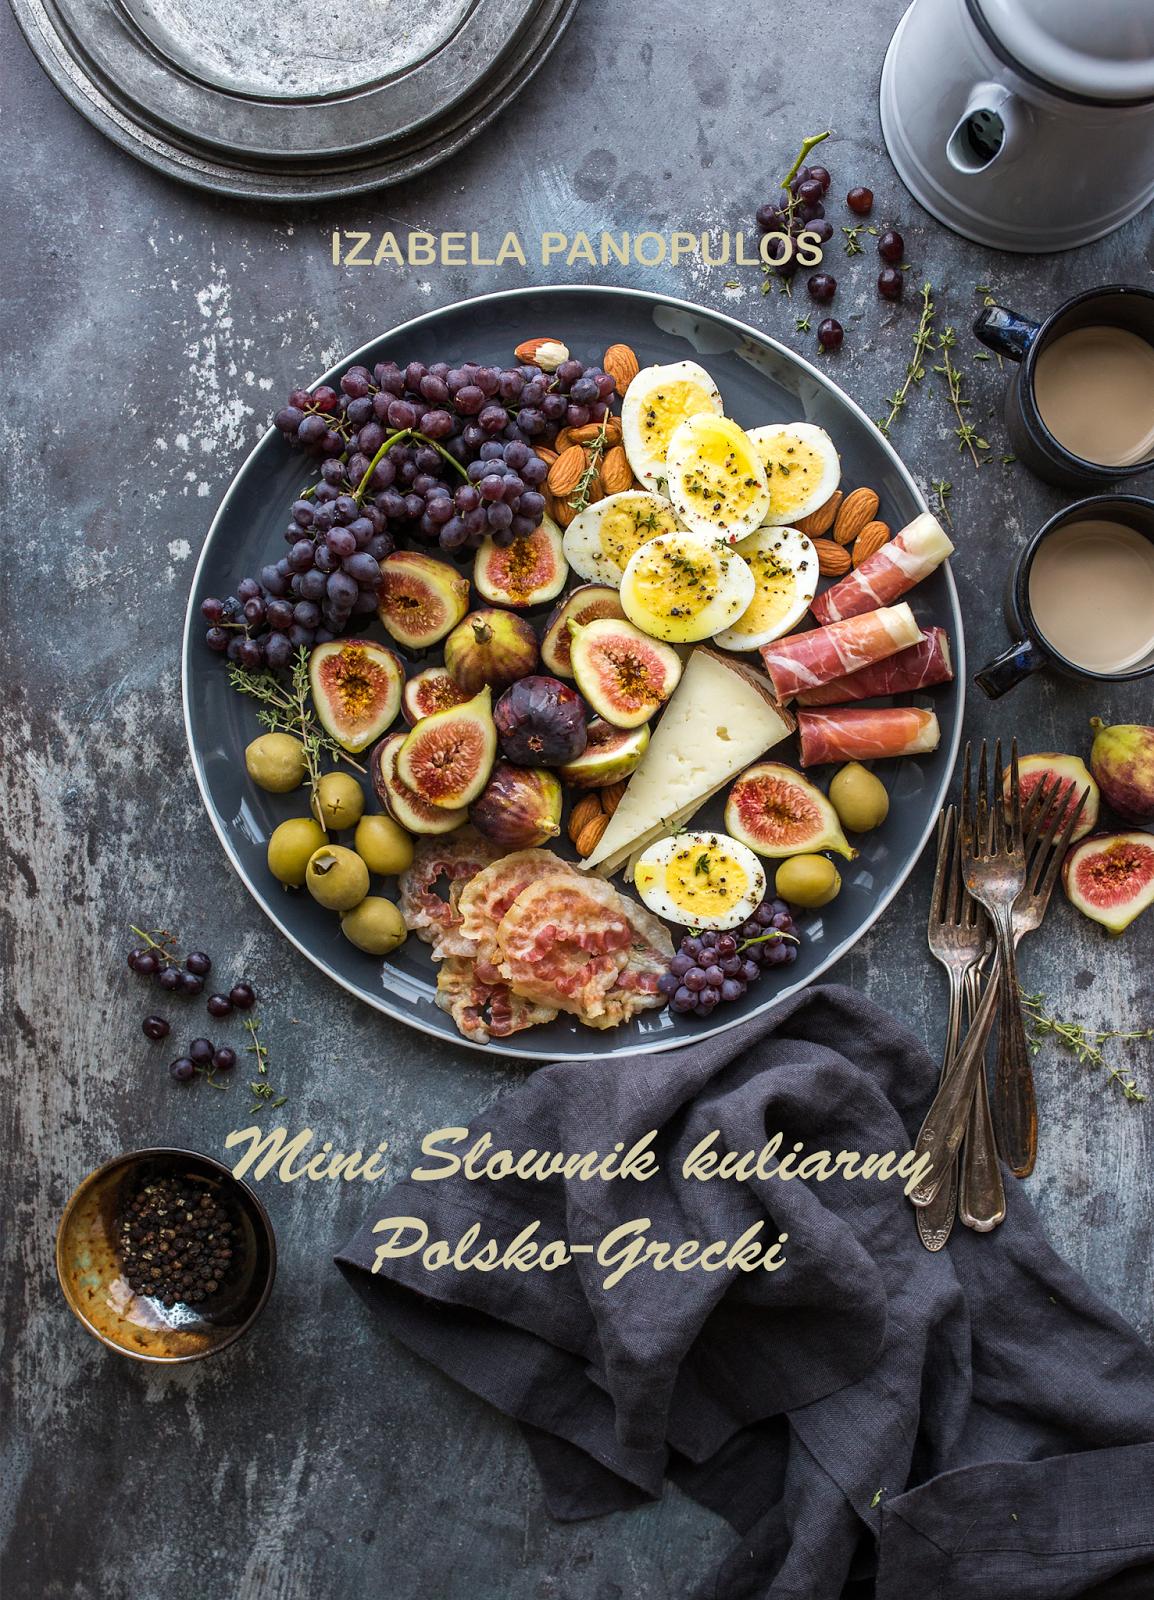 https://ridero.eu/pl/books/minislownik_kulinarny_polsko_-_grecki/#.WlcKpevJMLU.link